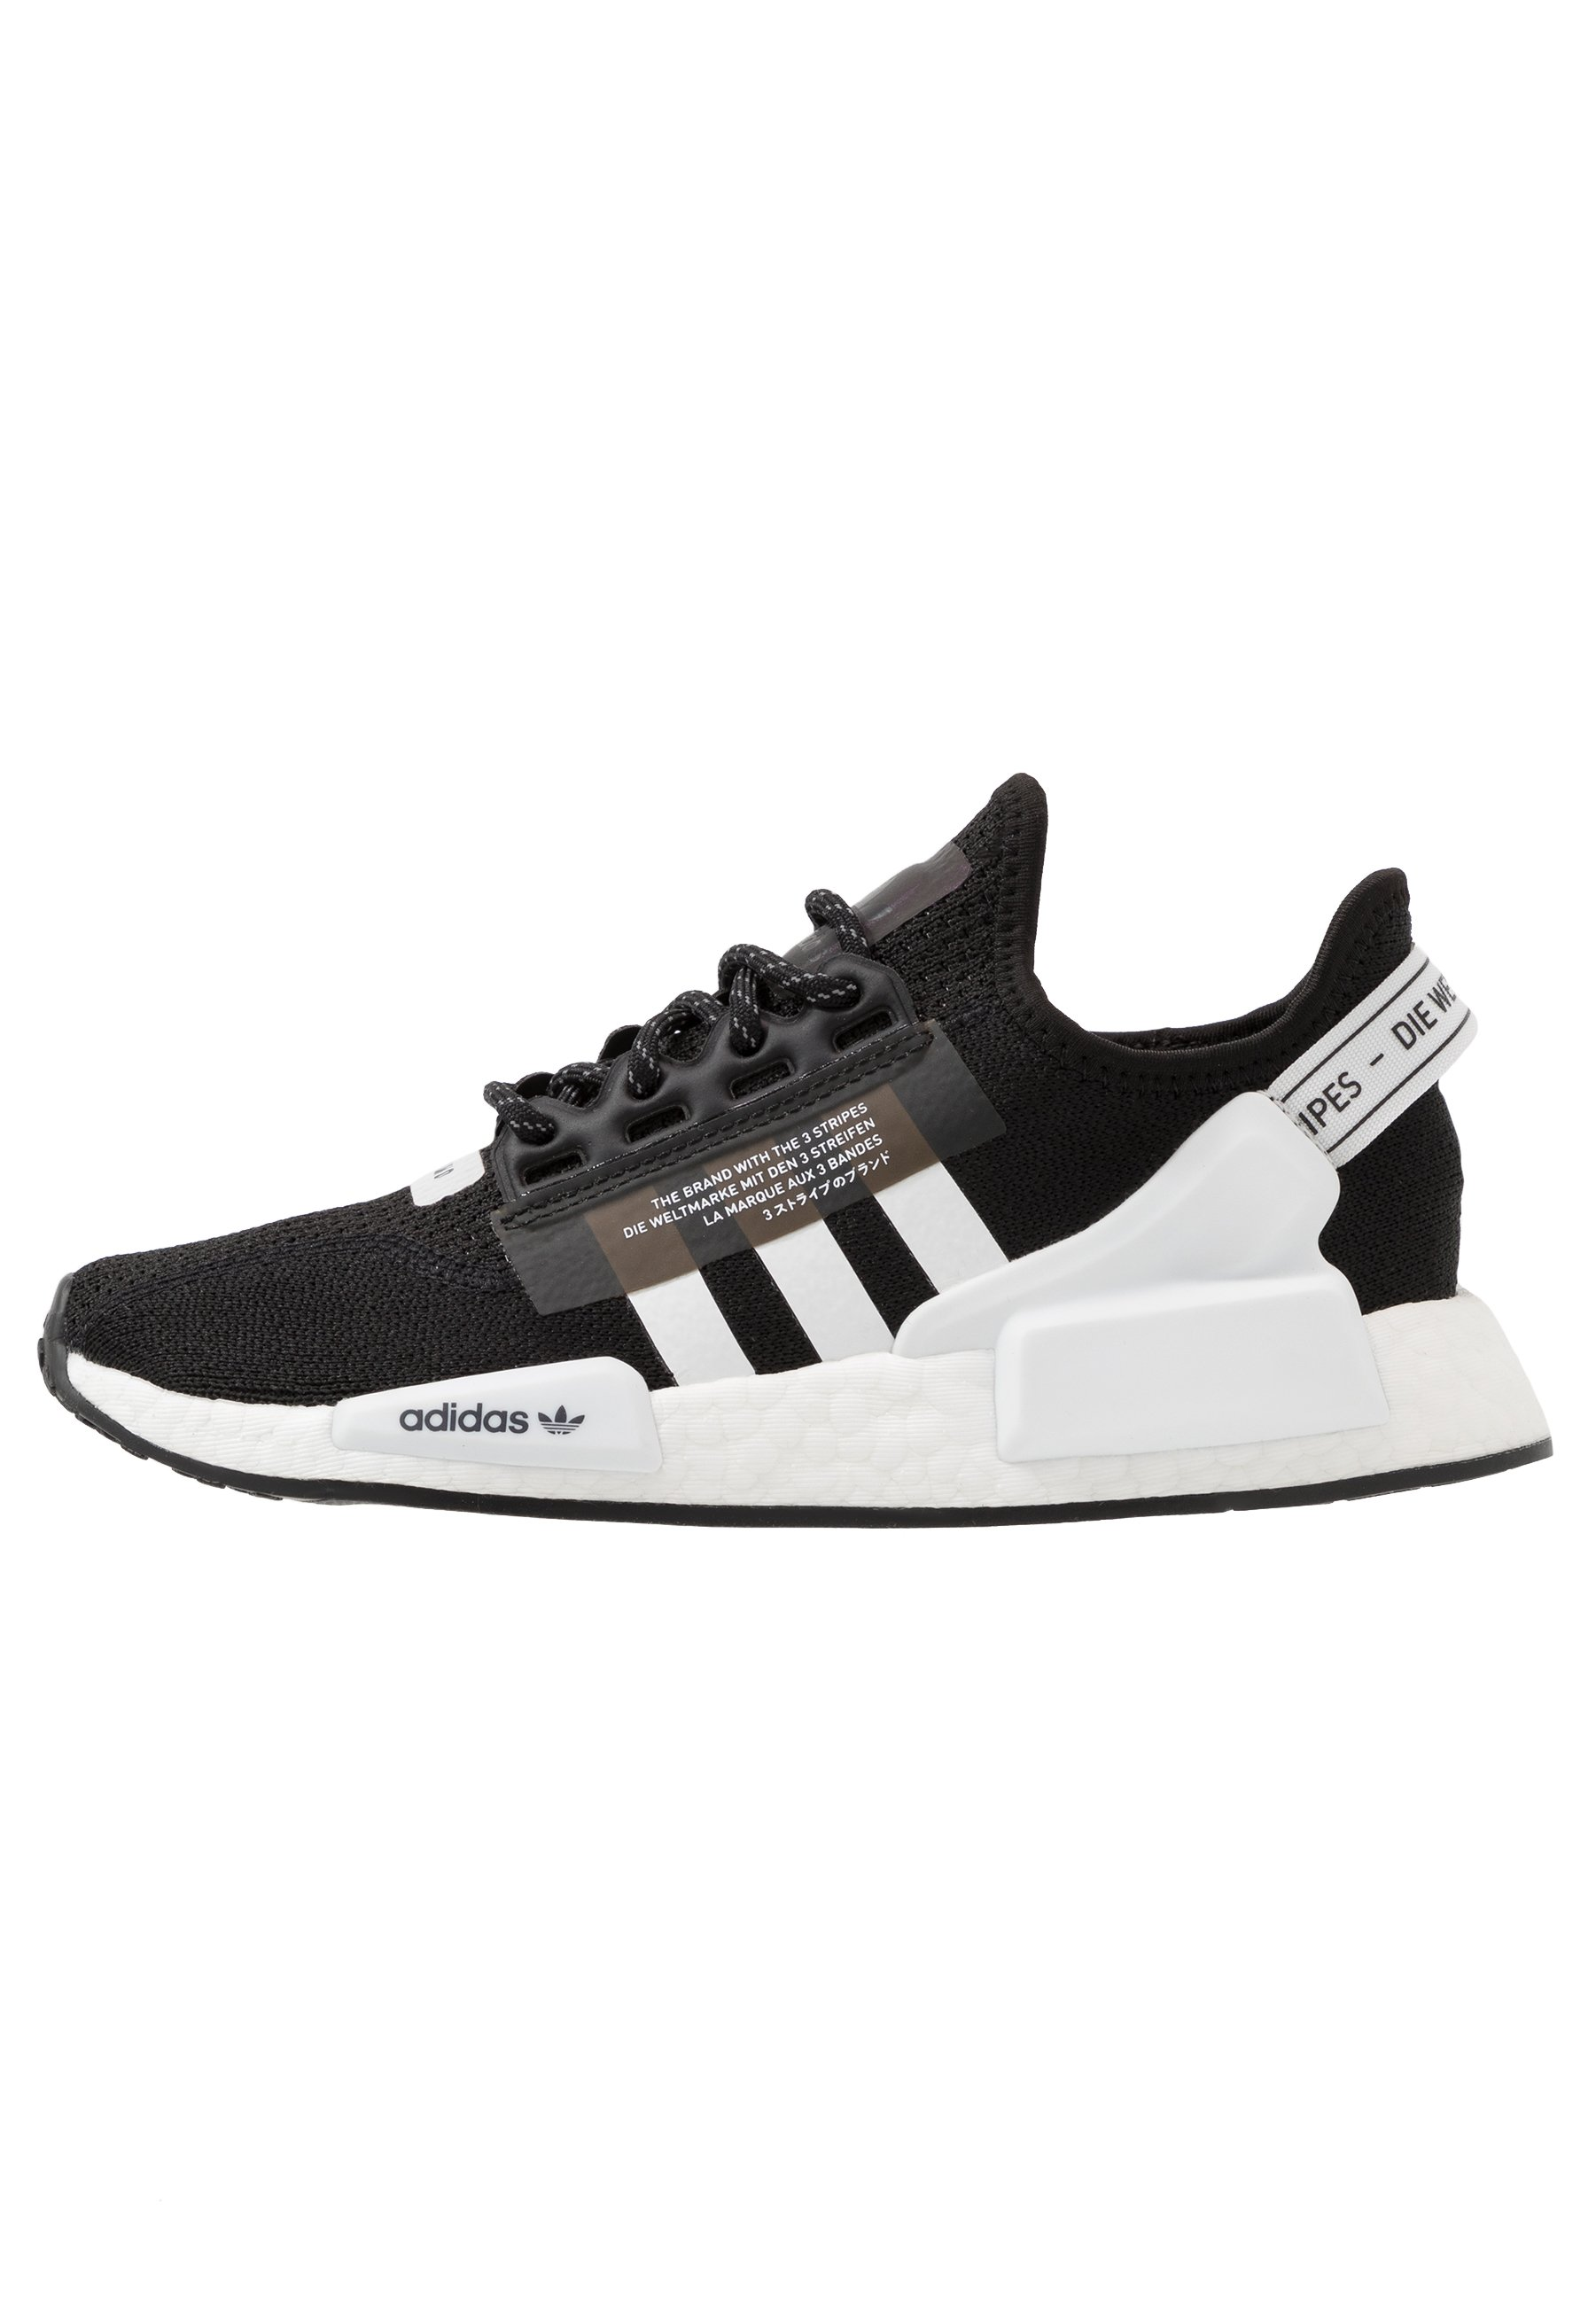 Adidas Originals Nmd_r1.v2 - Sneakers Basse Core Black/carbon Yhtdi